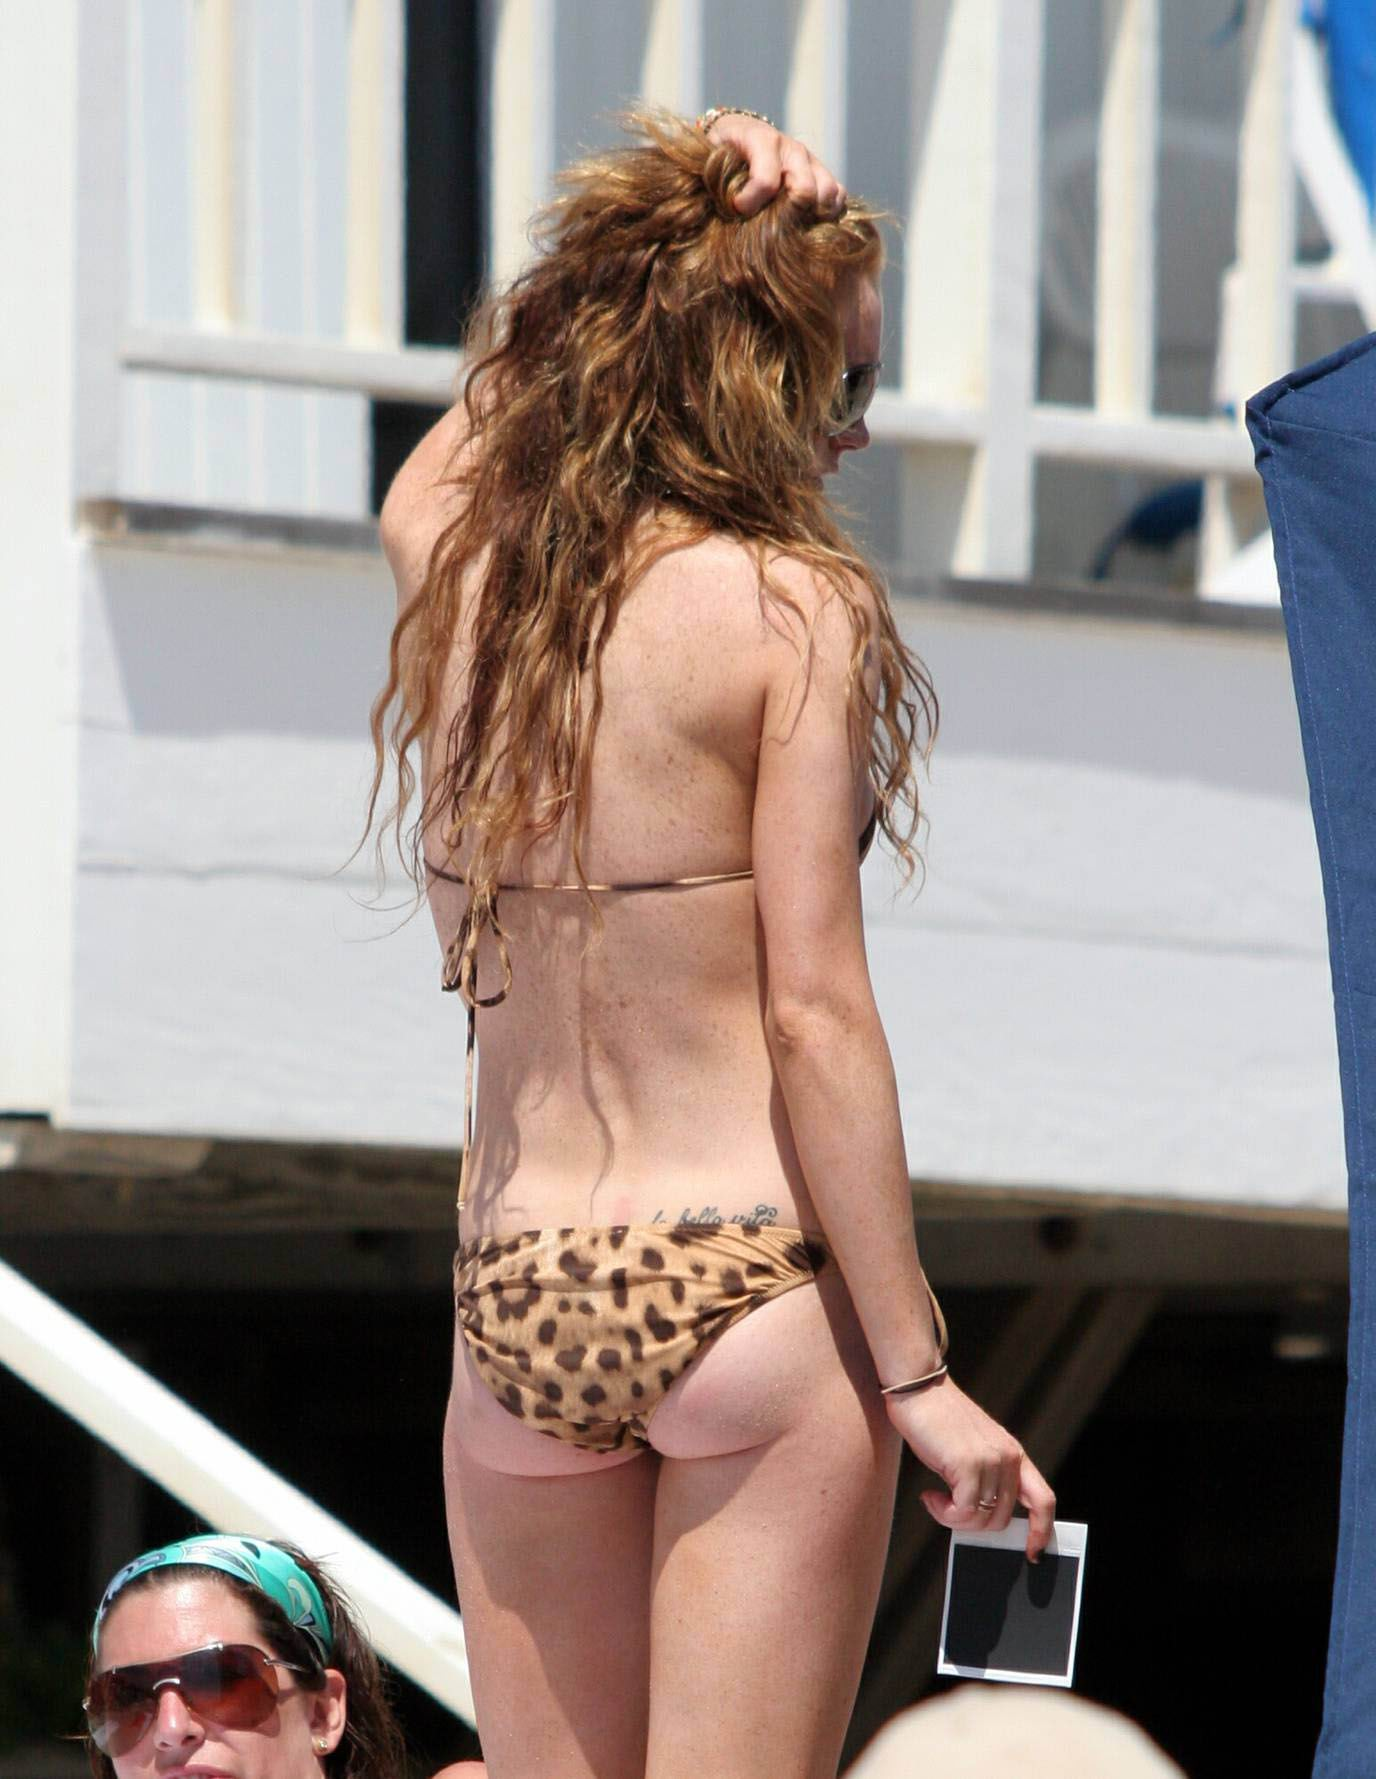 Lindsay lohan's ass